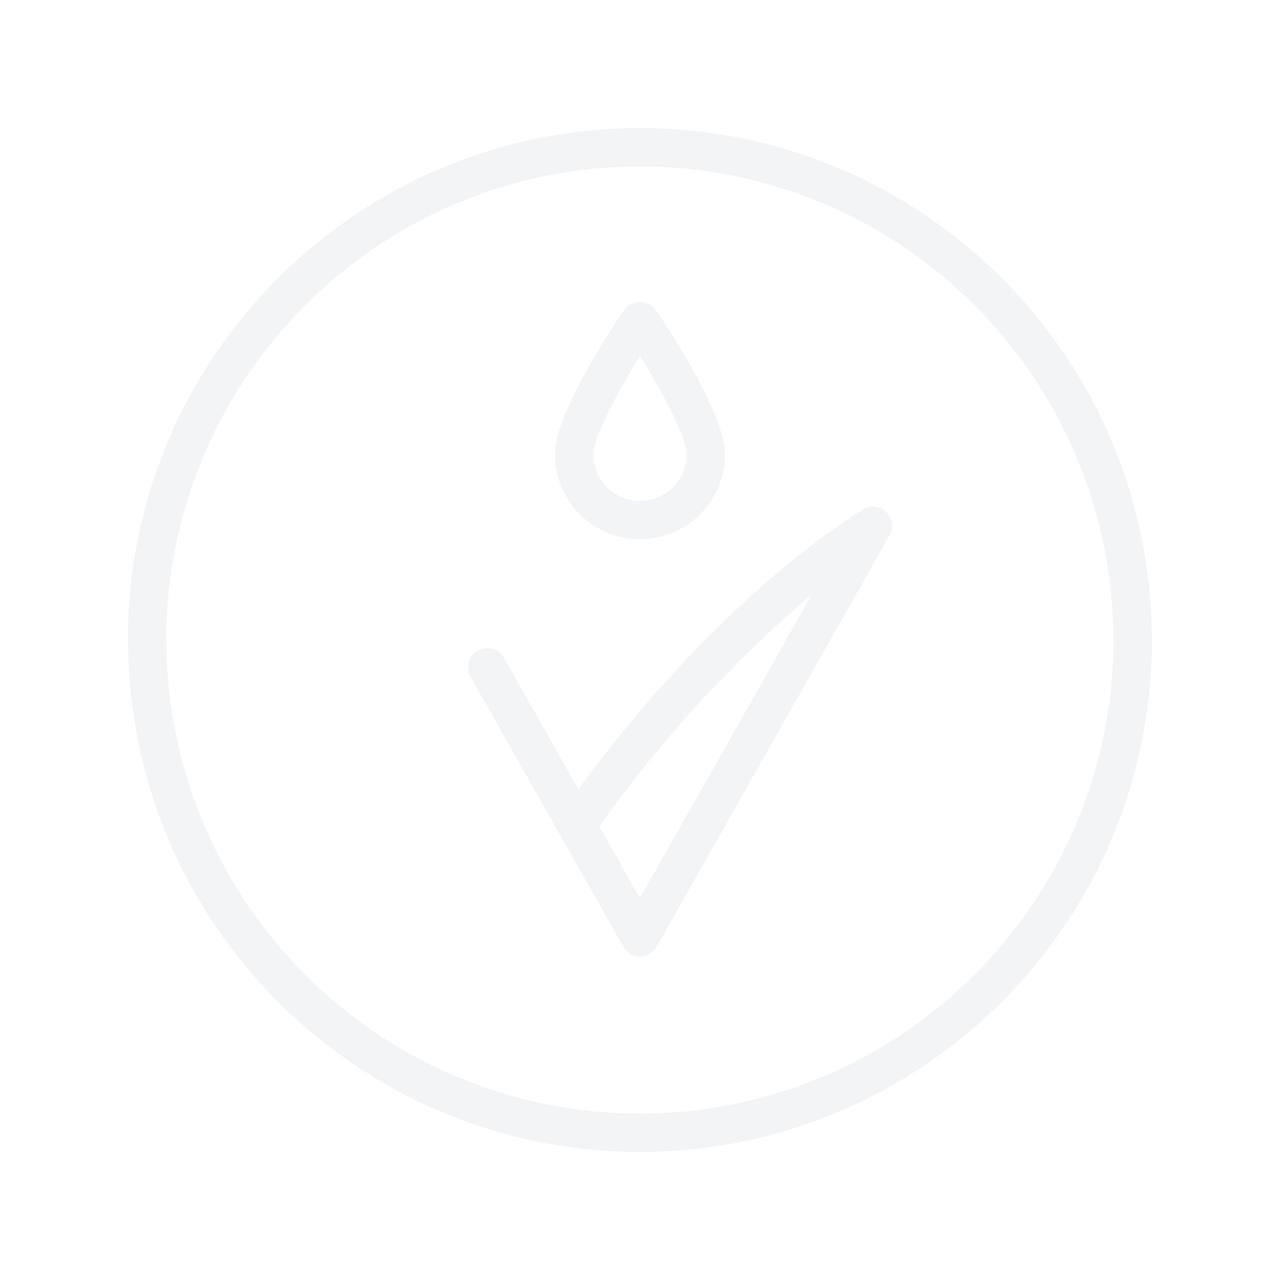 PIZ BUIN Tan & Protect Intensifying Sun Lotion SPF6 150ml